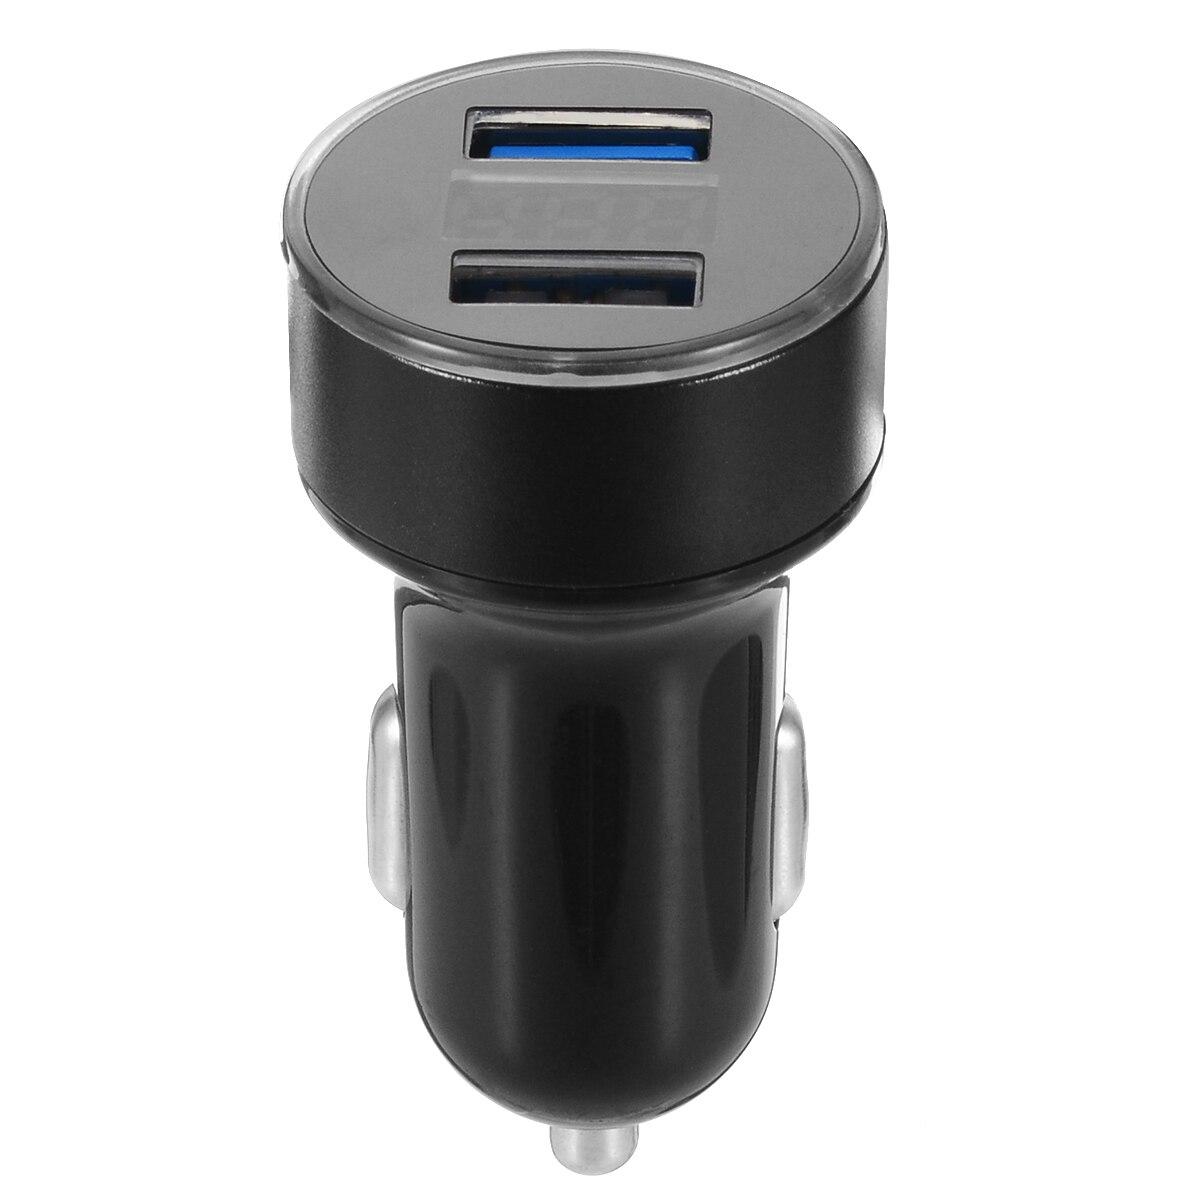 Car Charger 5V 3.1A With LED Display Universal Dual Usb Car-Charger For Phone 12-24V Cigarette Socket Lighter